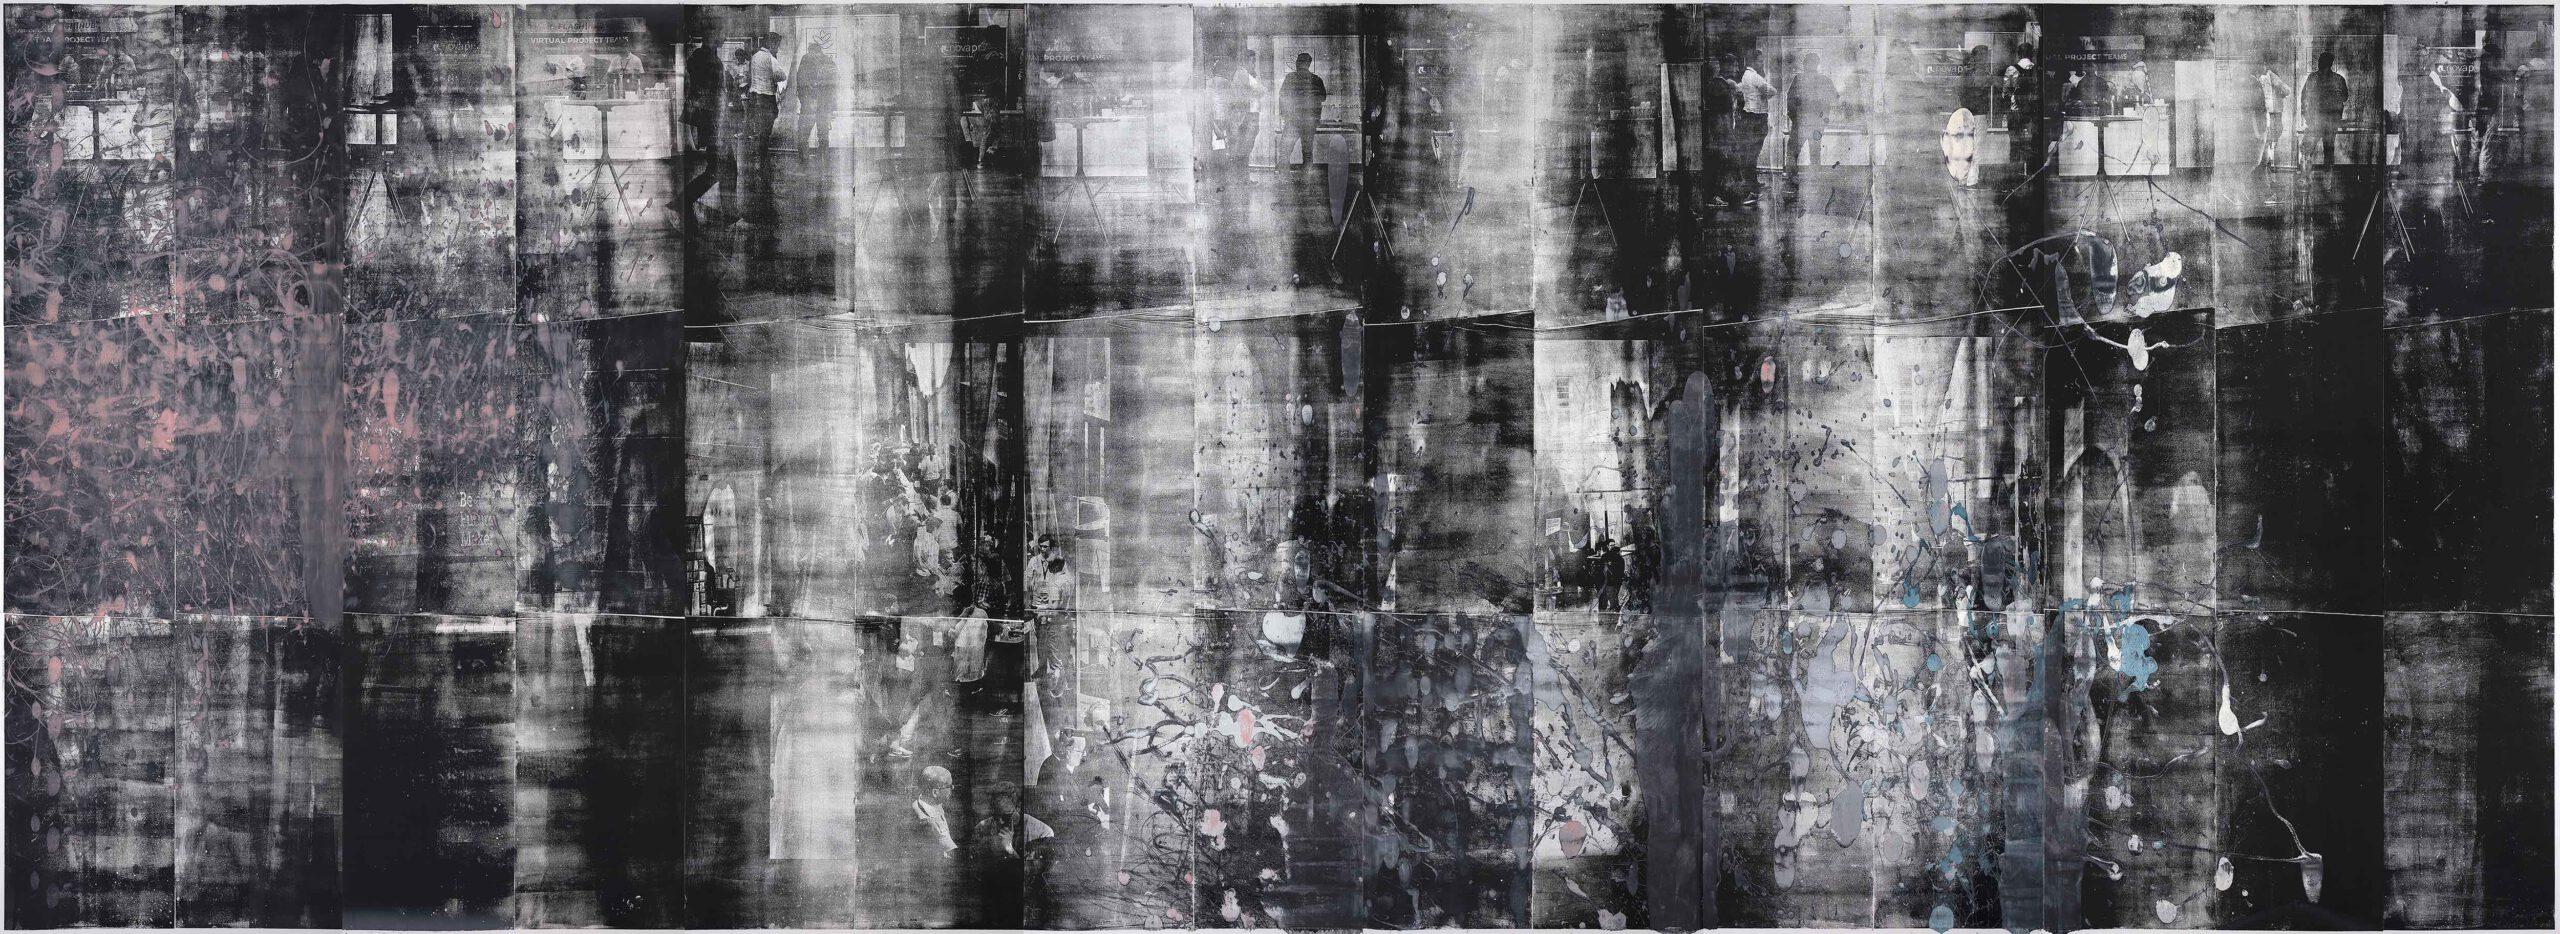 Kohärenz, 2019, wood engraving, 273,5 x 705,2 cm